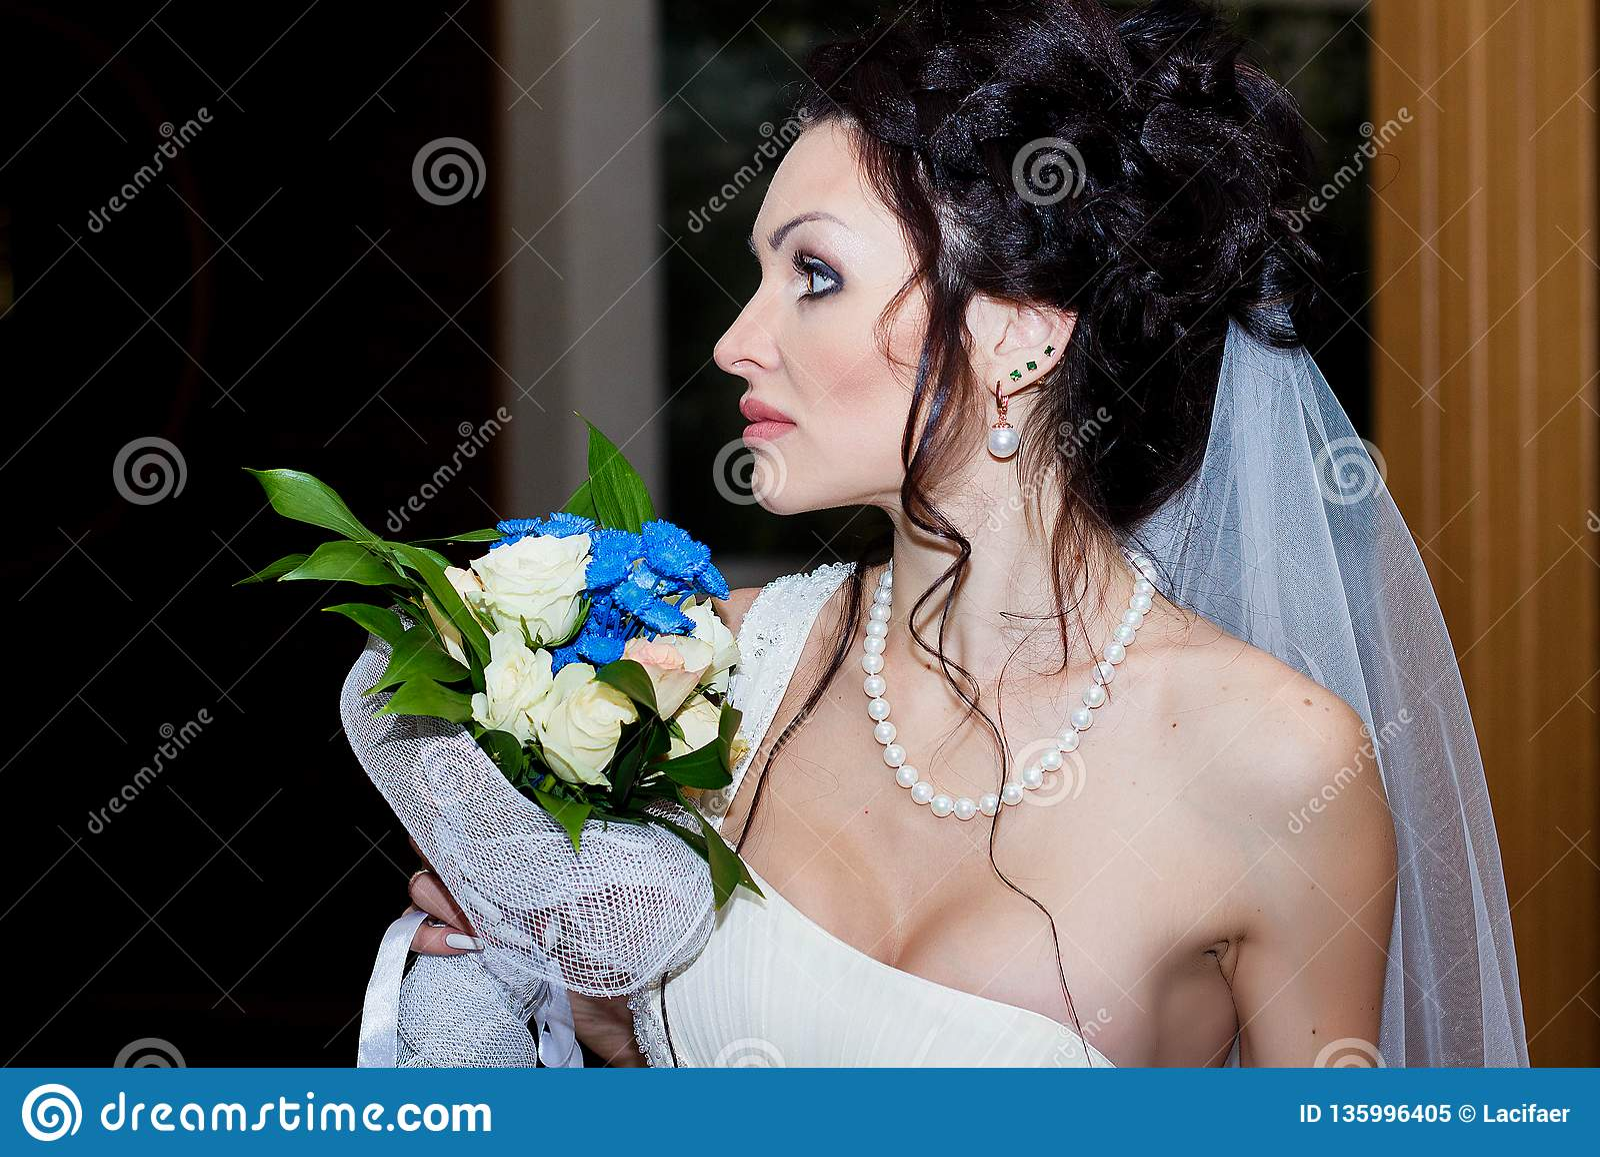 Portrait of the bride close-up with wedding bouquet. Indoor, Studio, interior